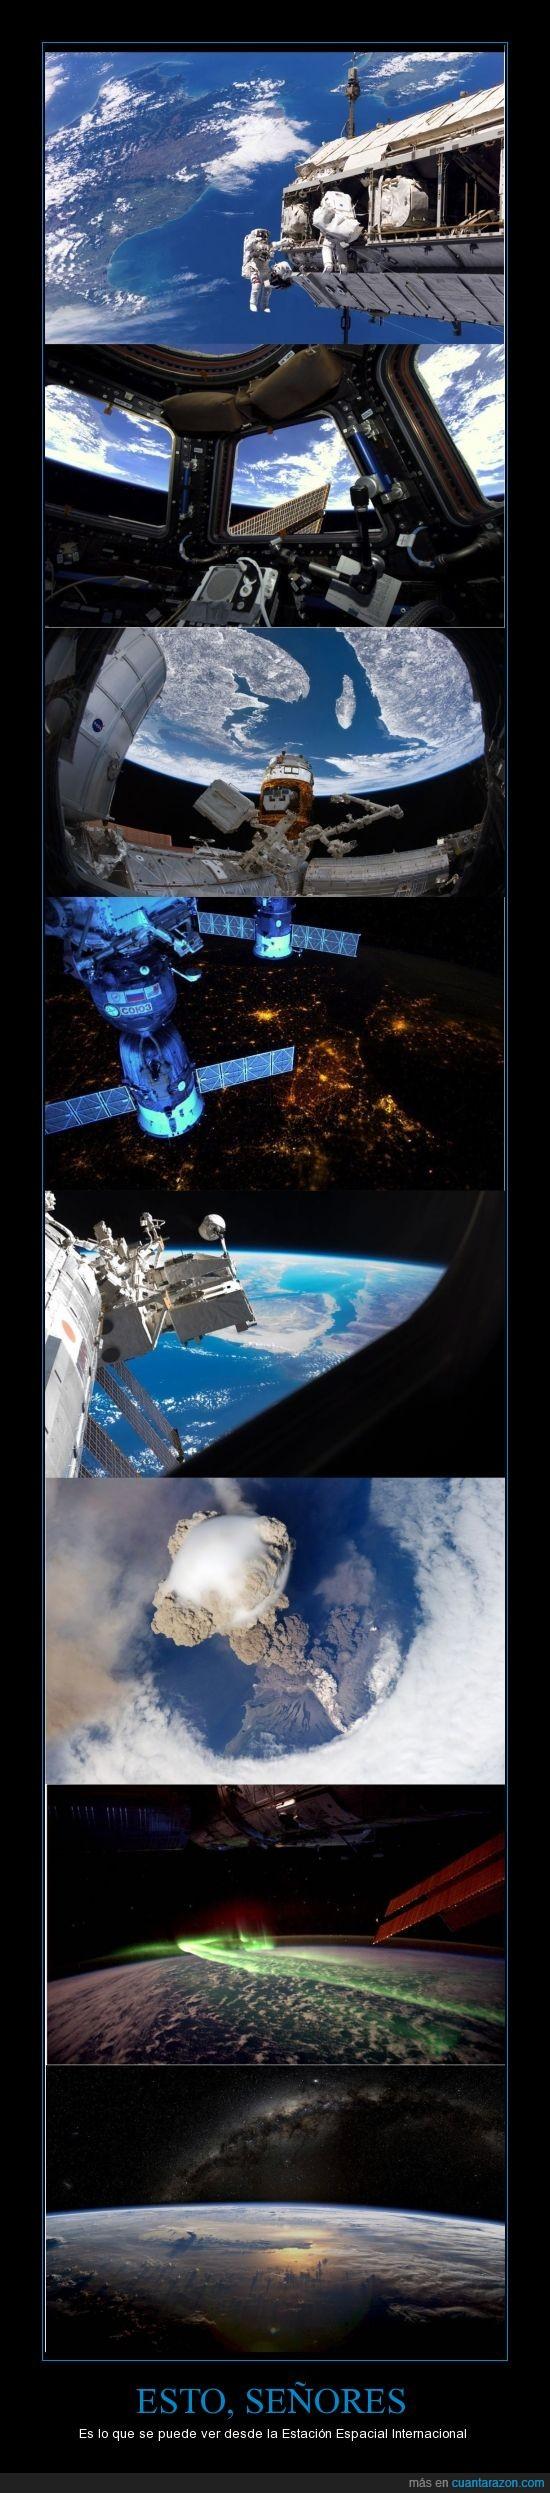 astronautas,aurora australis,estación espacial internacional,europa,iss,península del sinaí,québec,tierra,vía láctea